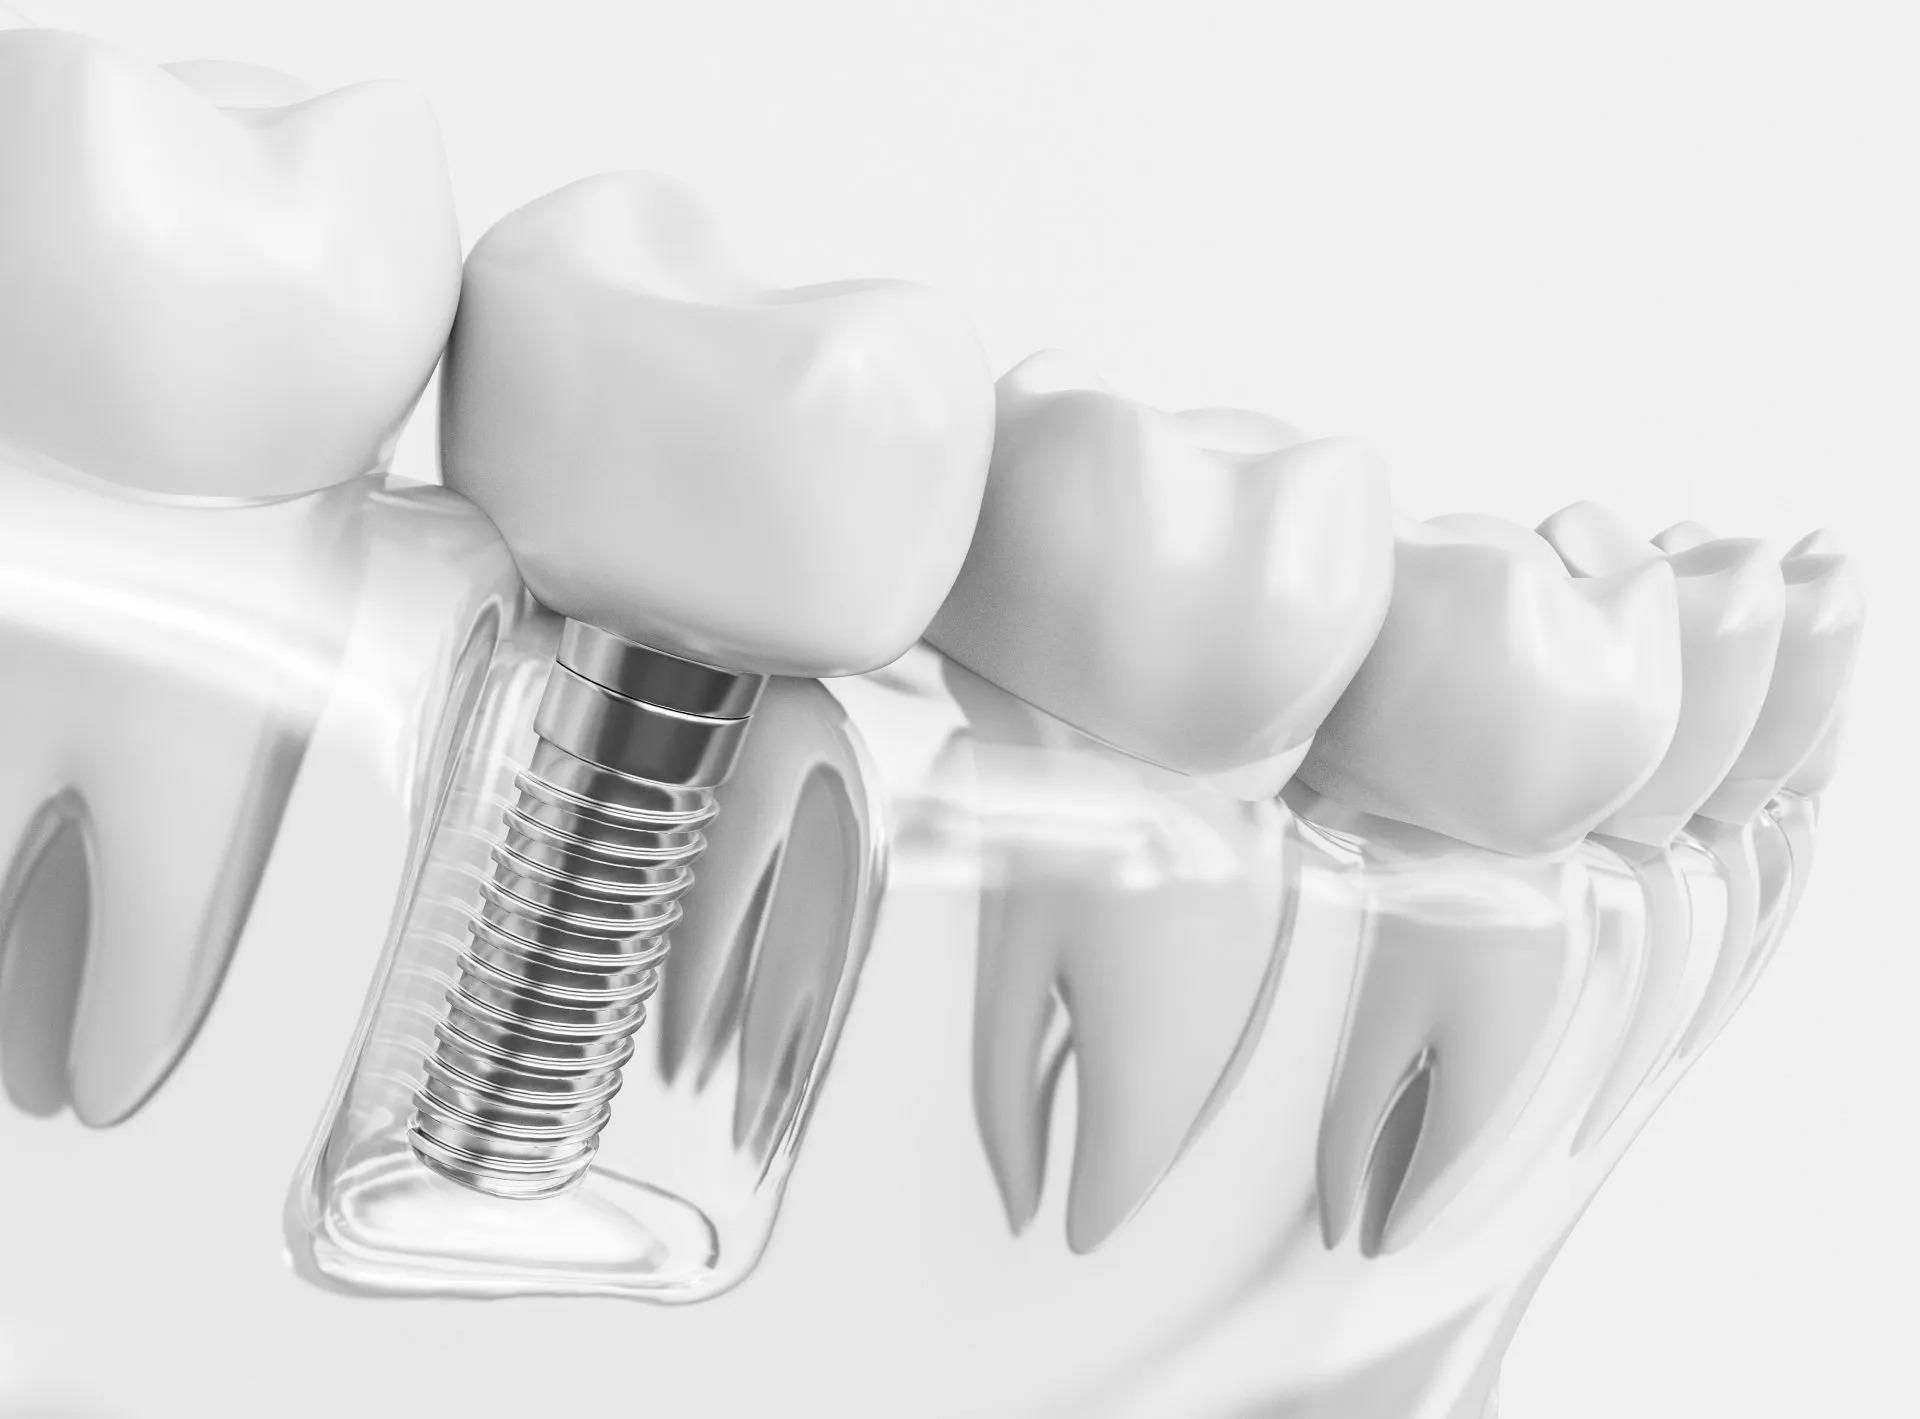 Dental Implants or Dentures: The Benefits of Implants